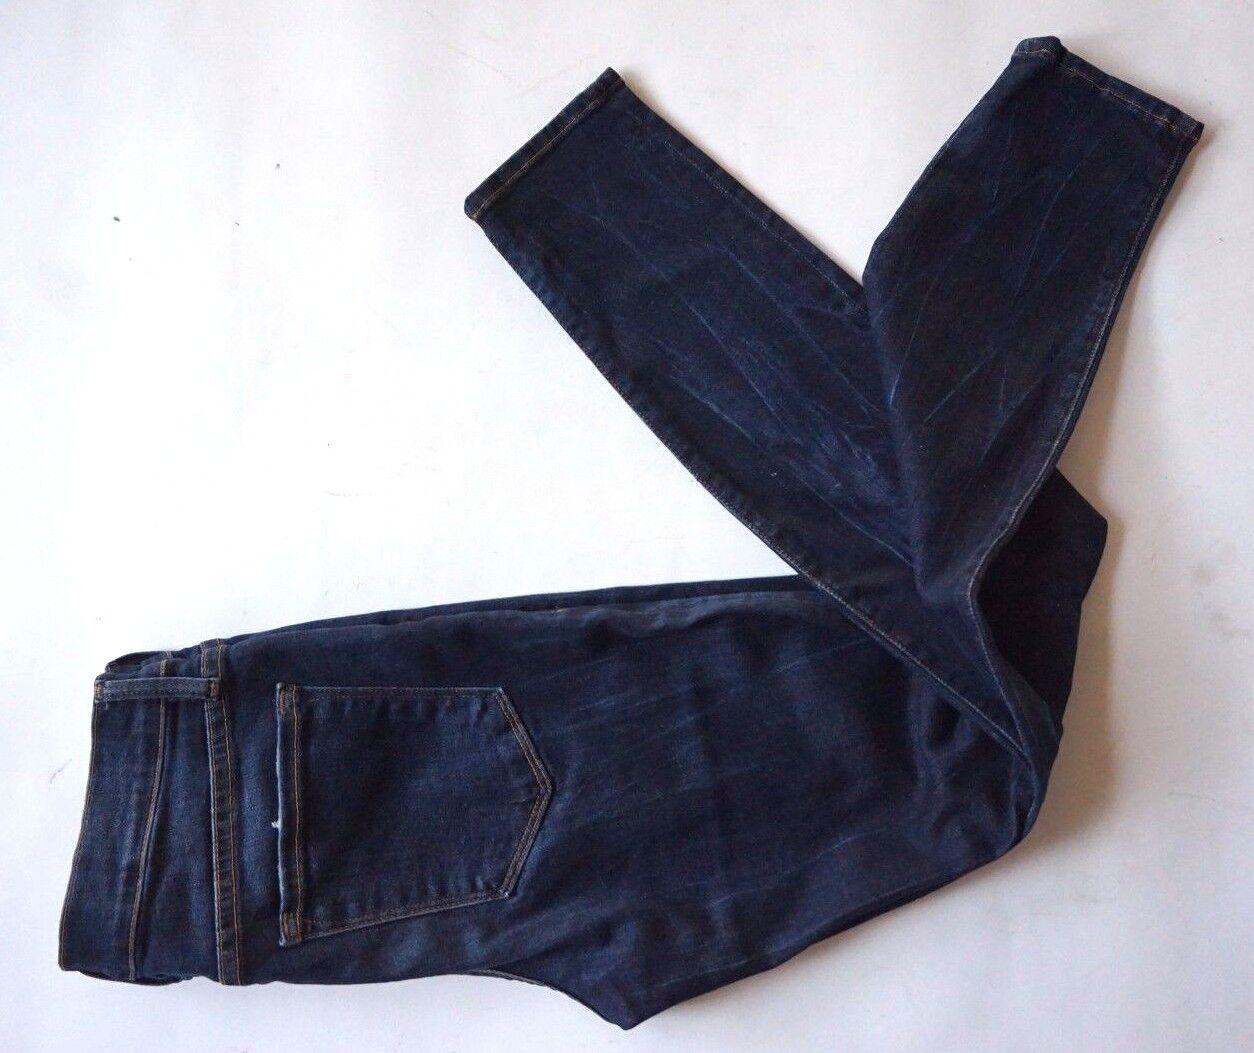 Nwot Rahmen Jeans Prince Street LSJ665 Skinny Blau Jeans Damen Größe 29